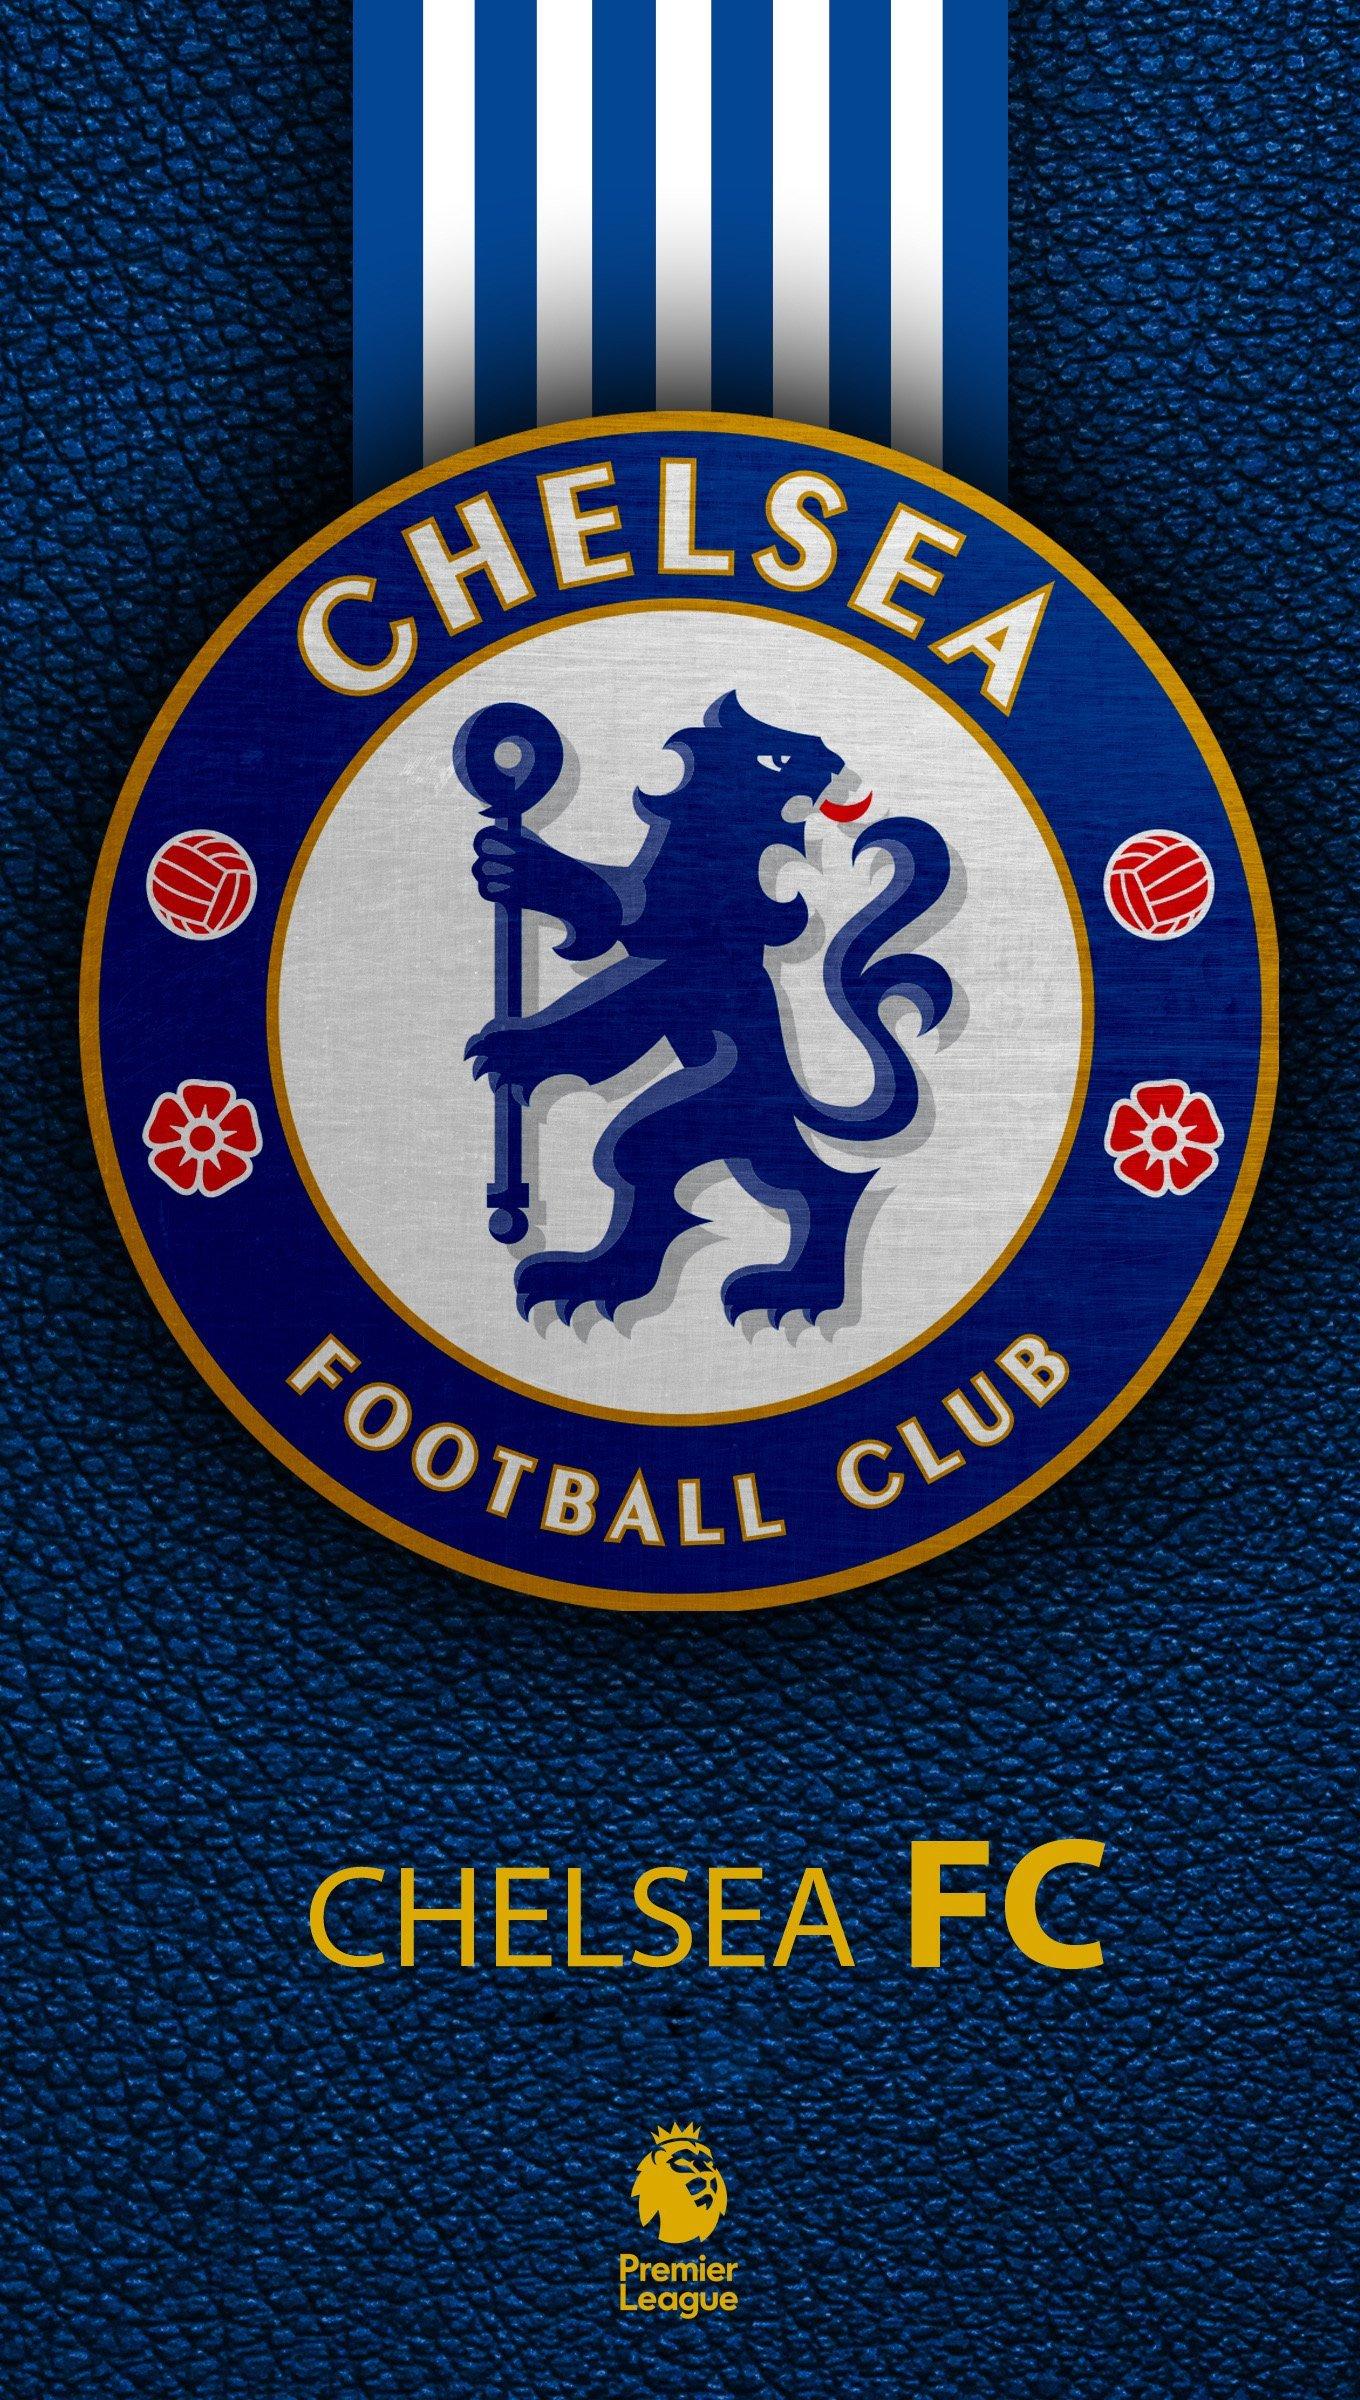 Fondos de pantalla Chelsea Football Club Vertical